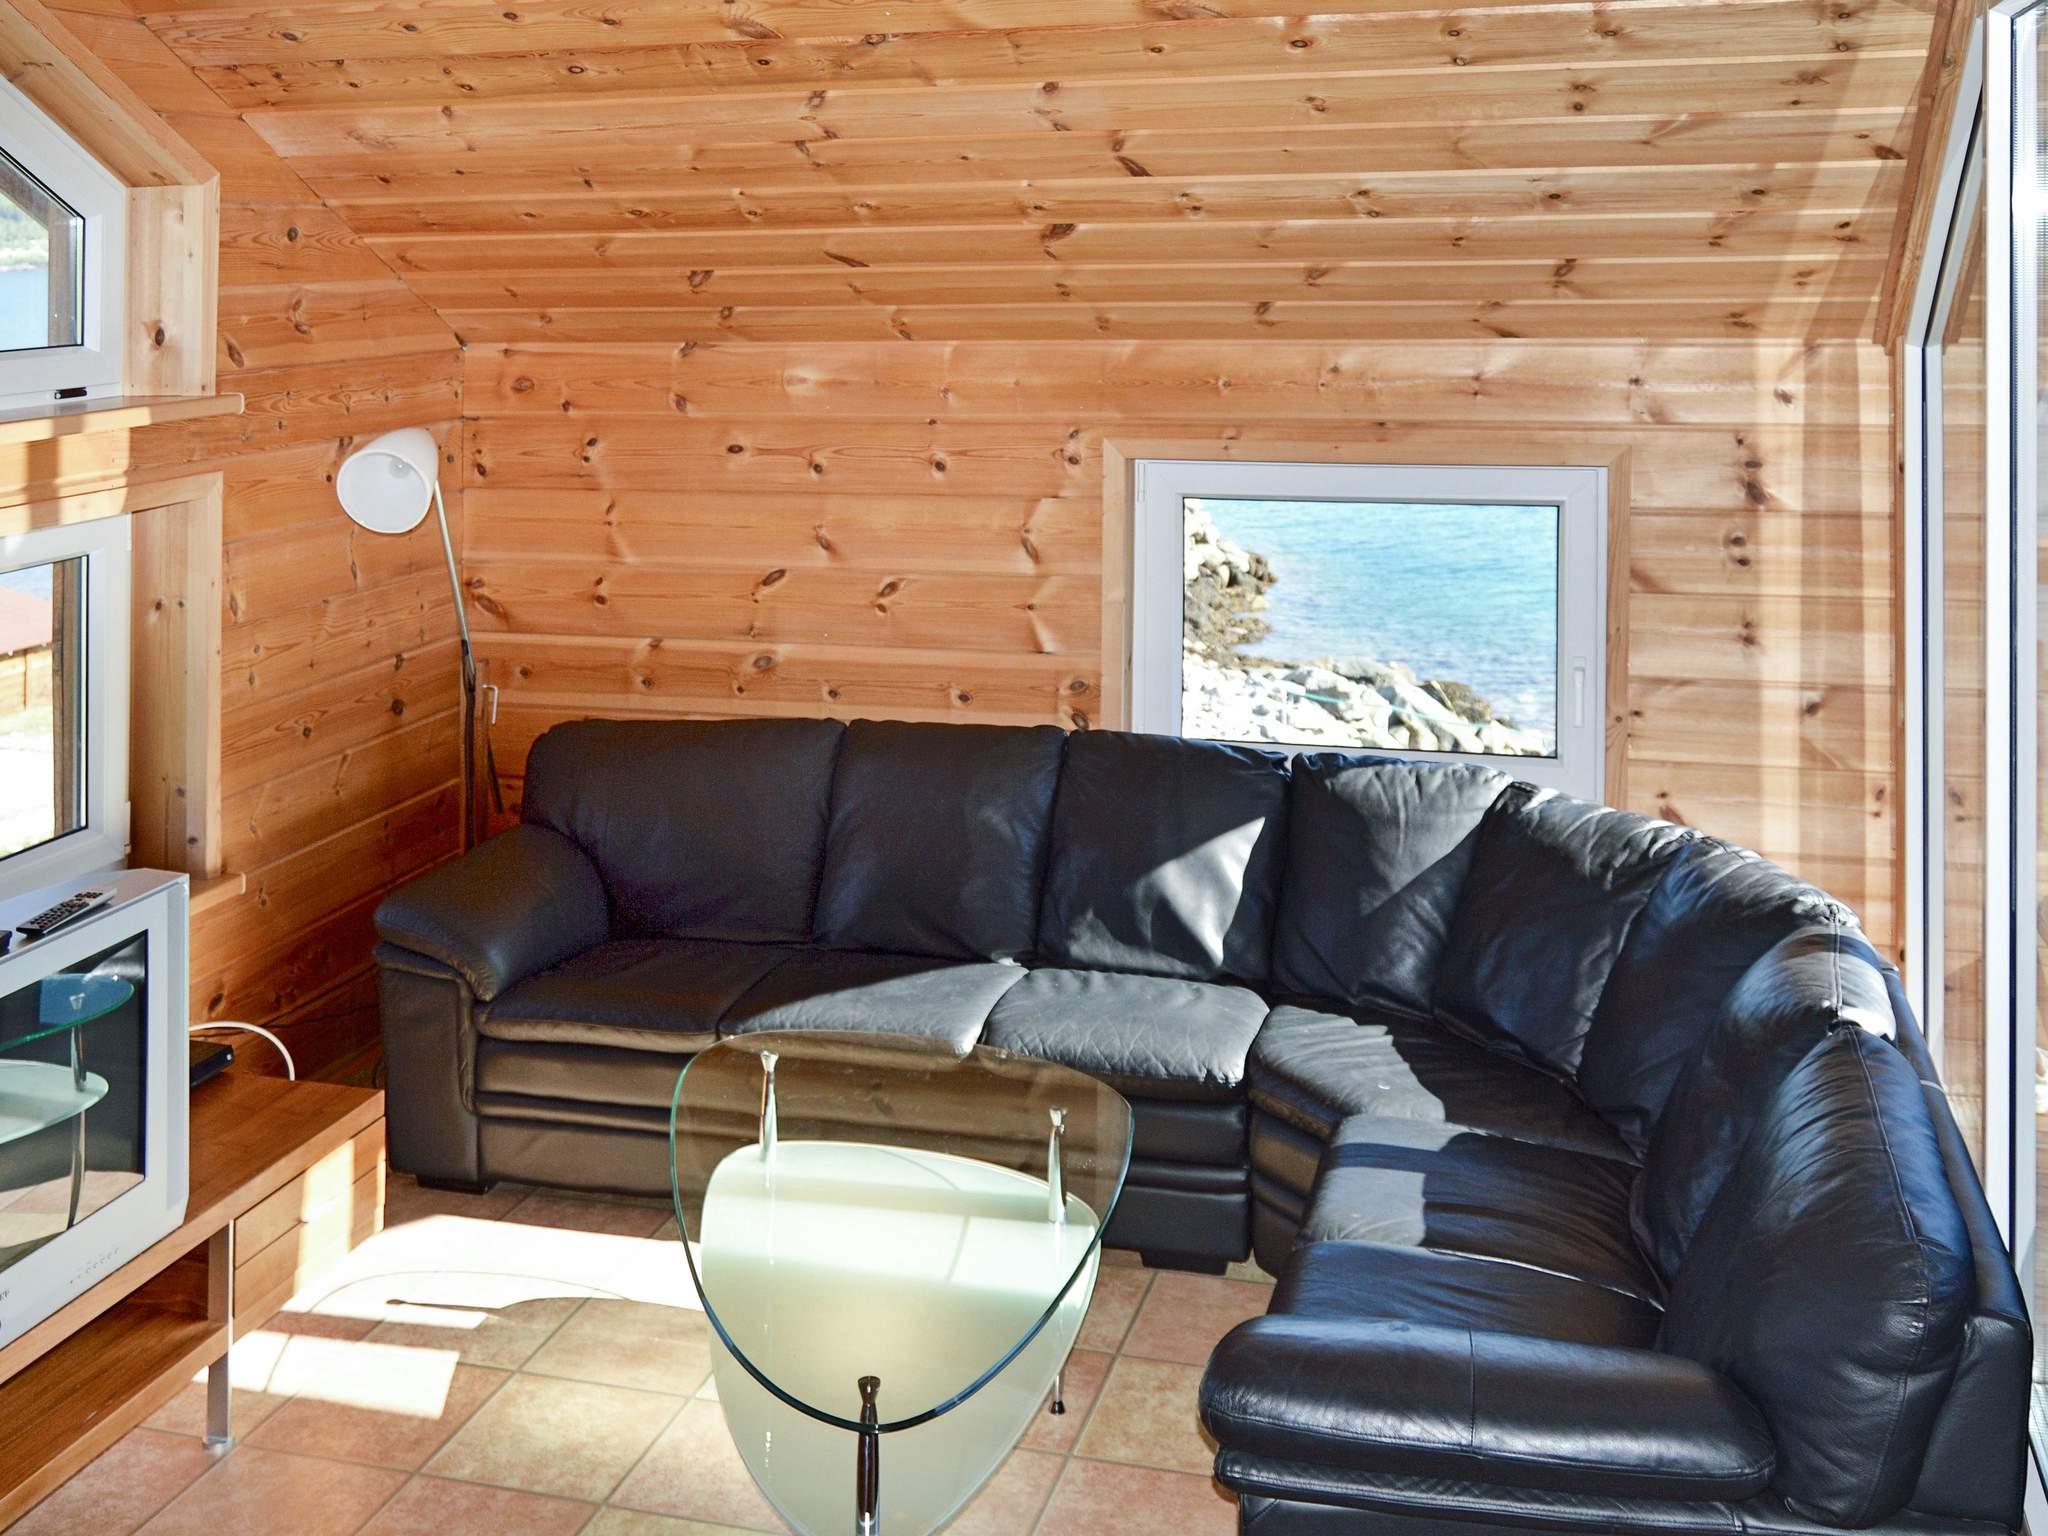 Ferienhaus Eidsvåg (135541), Eidsvåg, More - Romsdal, Westnorwegen, Norwegen, Bild 2